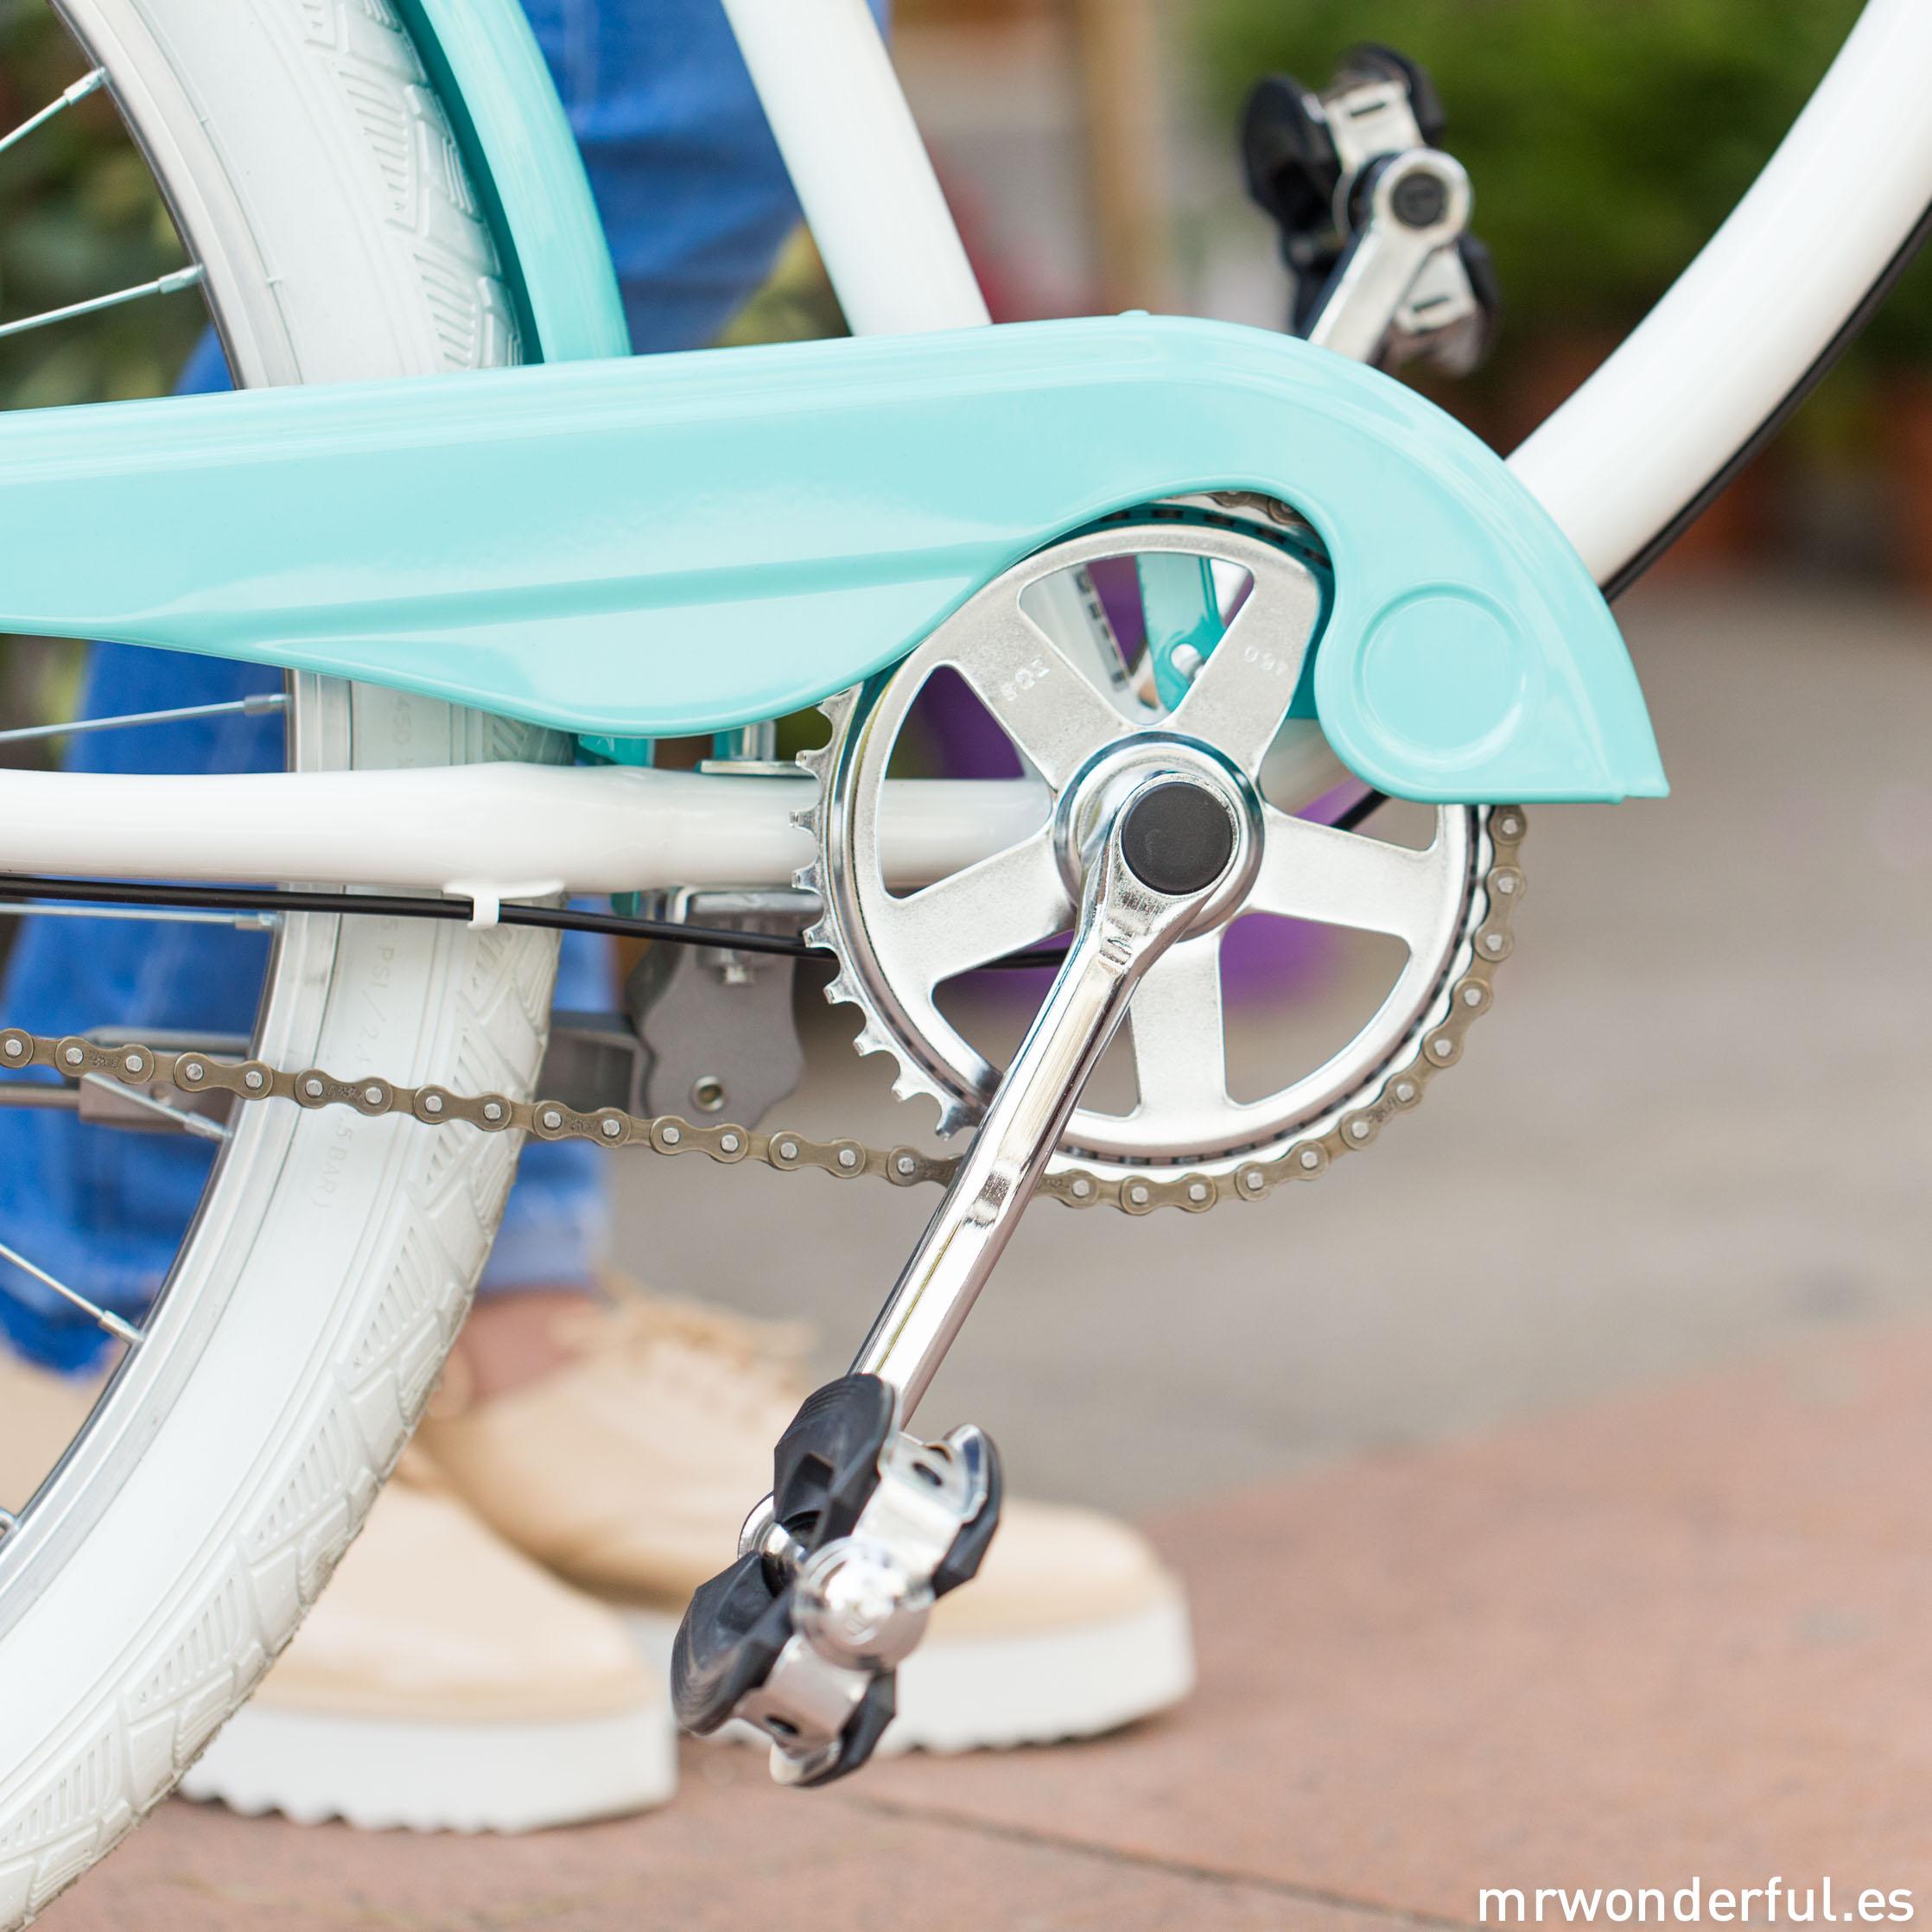 mrwonderful_concurso-bicicleta-20